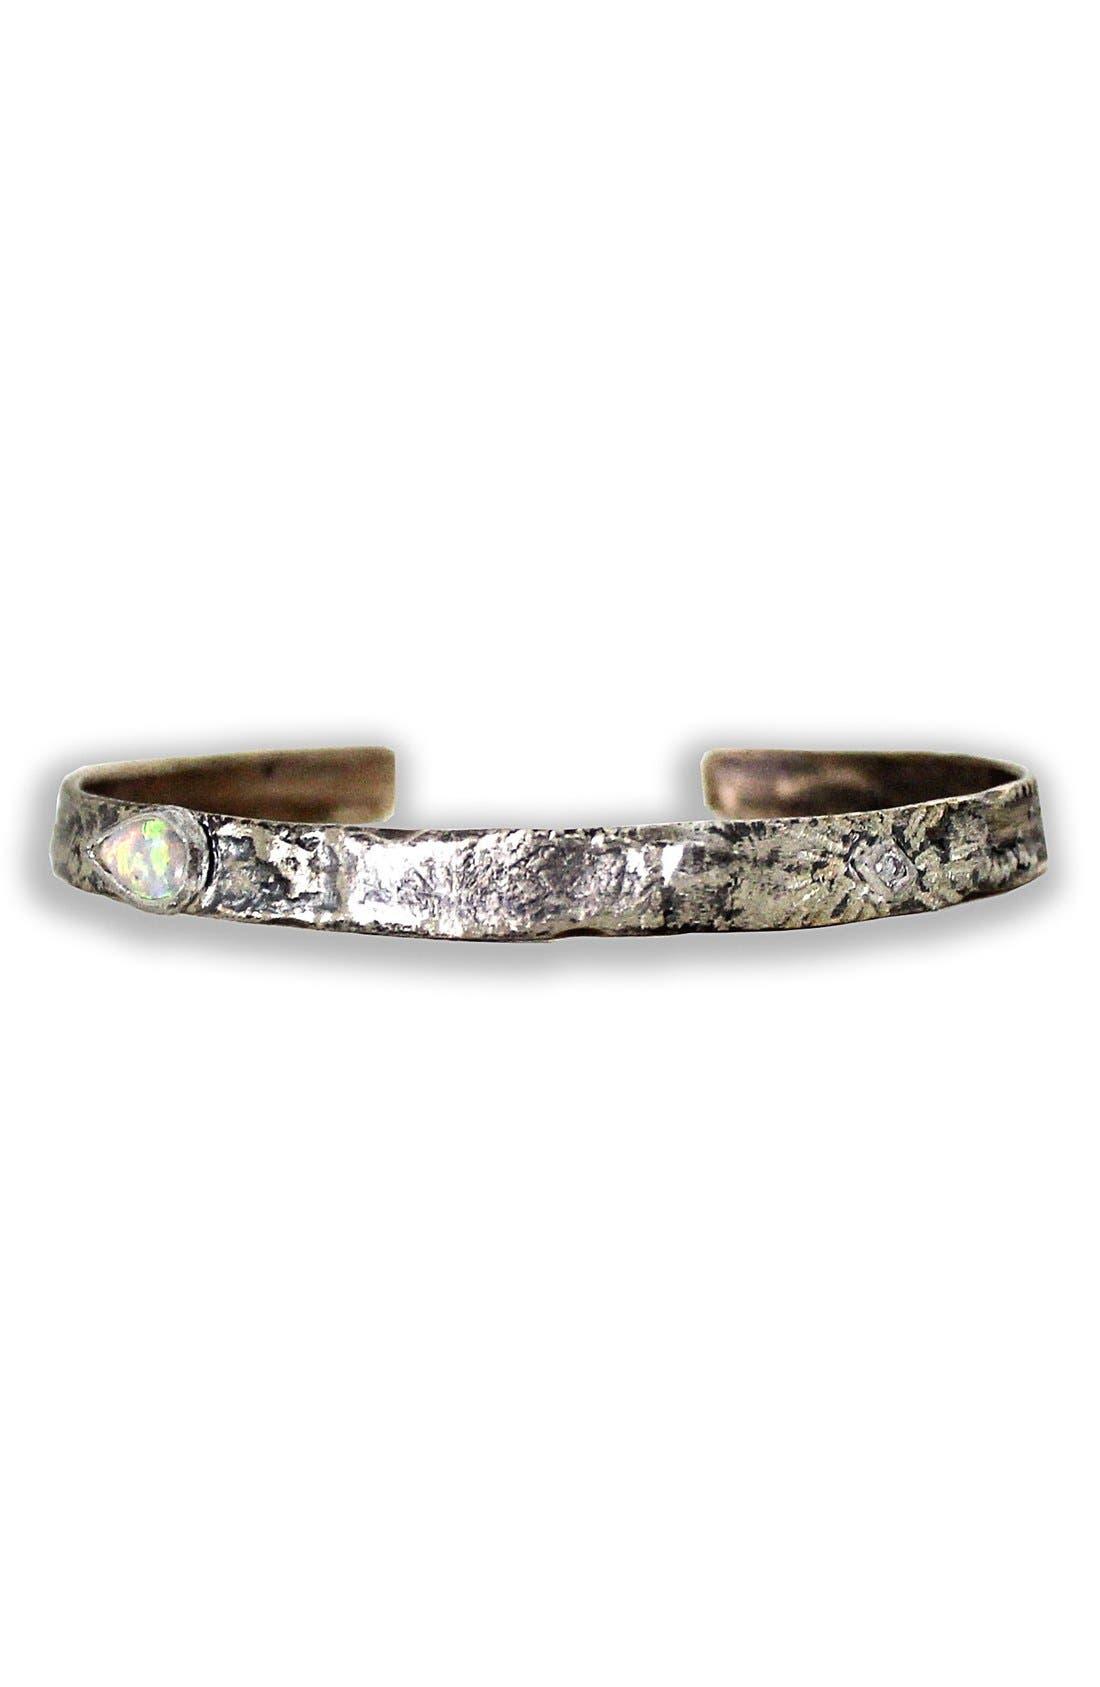 Alternate Image 1 Selected - Franny E Jewelry Opal & Diamond Cuff Bracelet